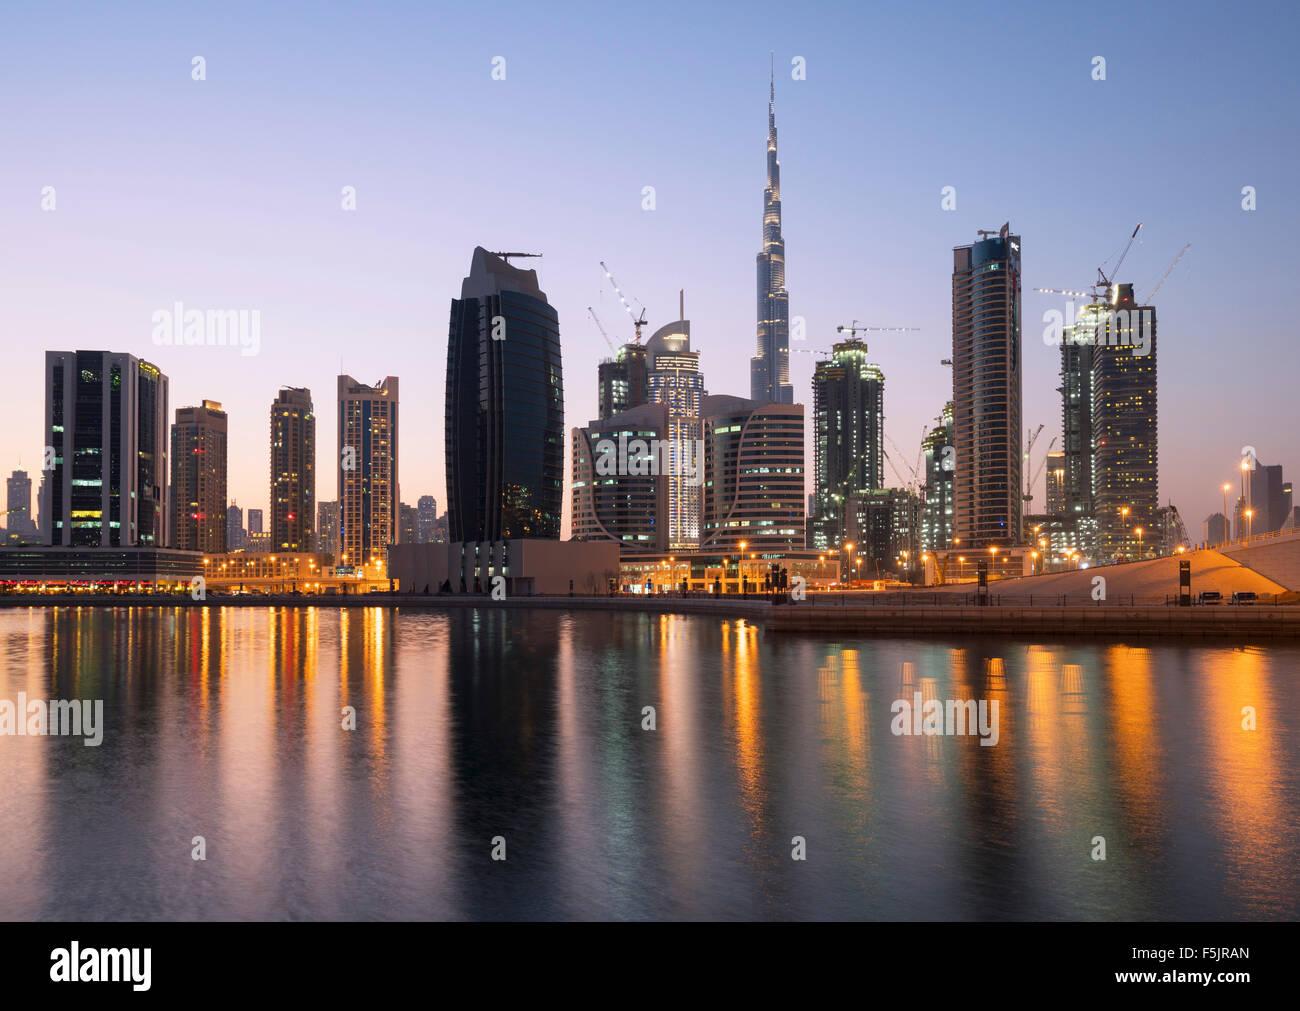 Skyline di torri si riflette nel torrente al crepuscolo in Business Bay in Dubai Emirati Arabi Uniti Immagini Stock